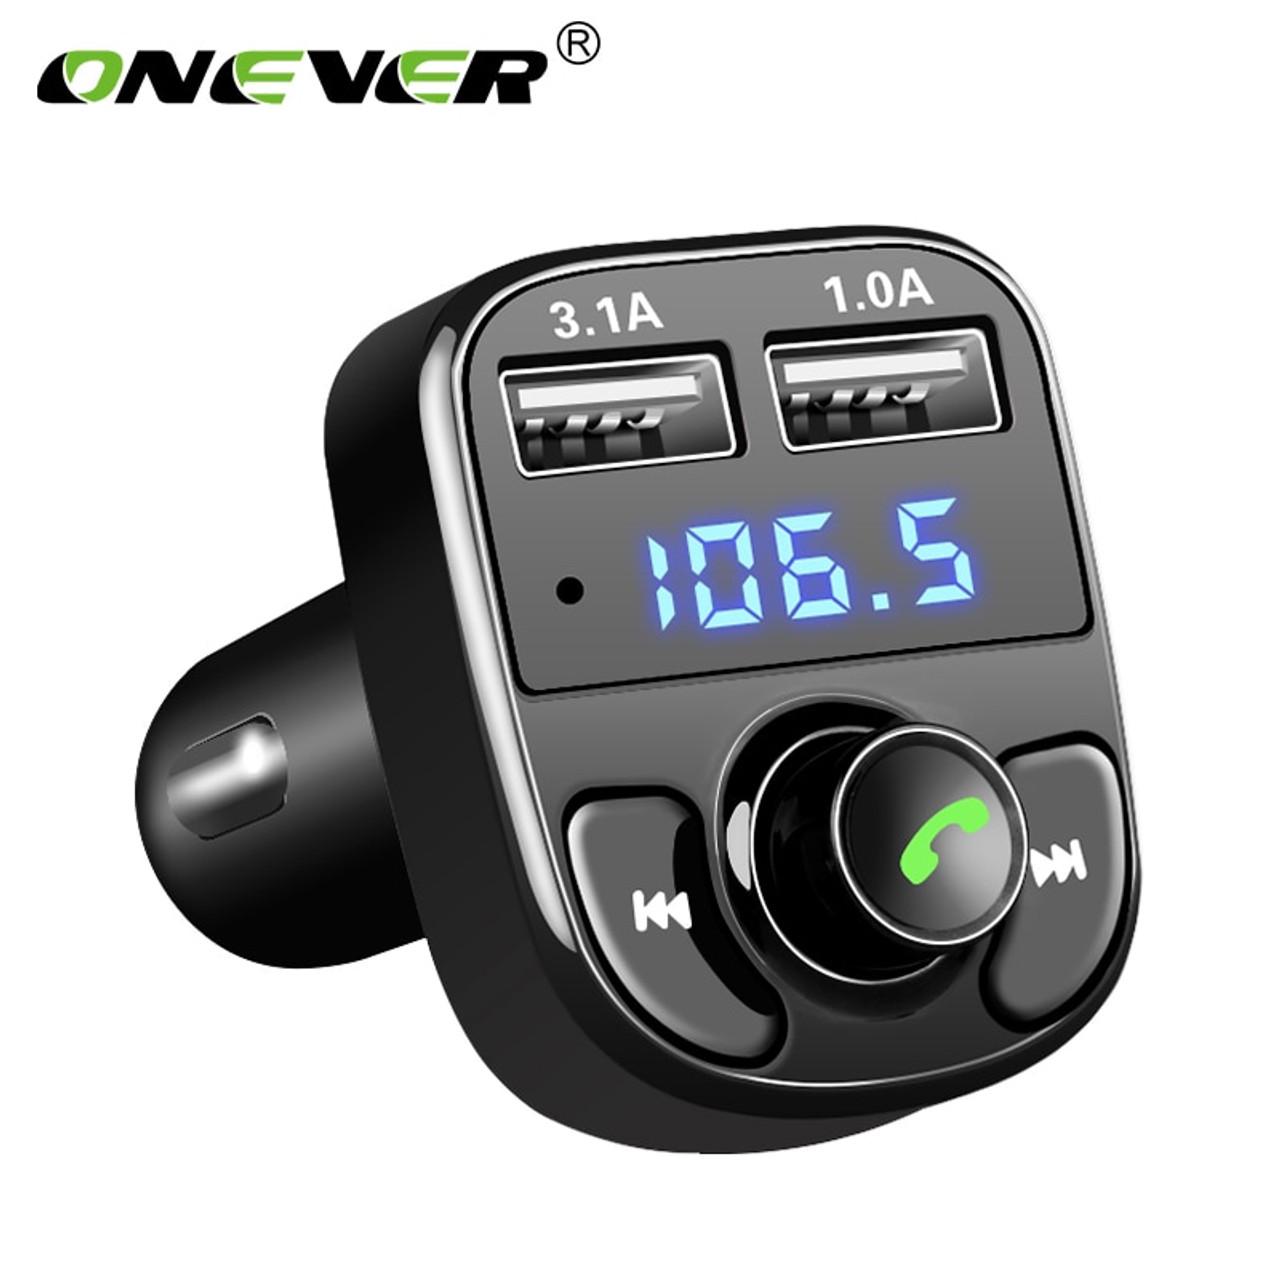 360° Wireless Bluetooth Handsfree C2 FM Transmitter Radio Adapter MP3 Player A1